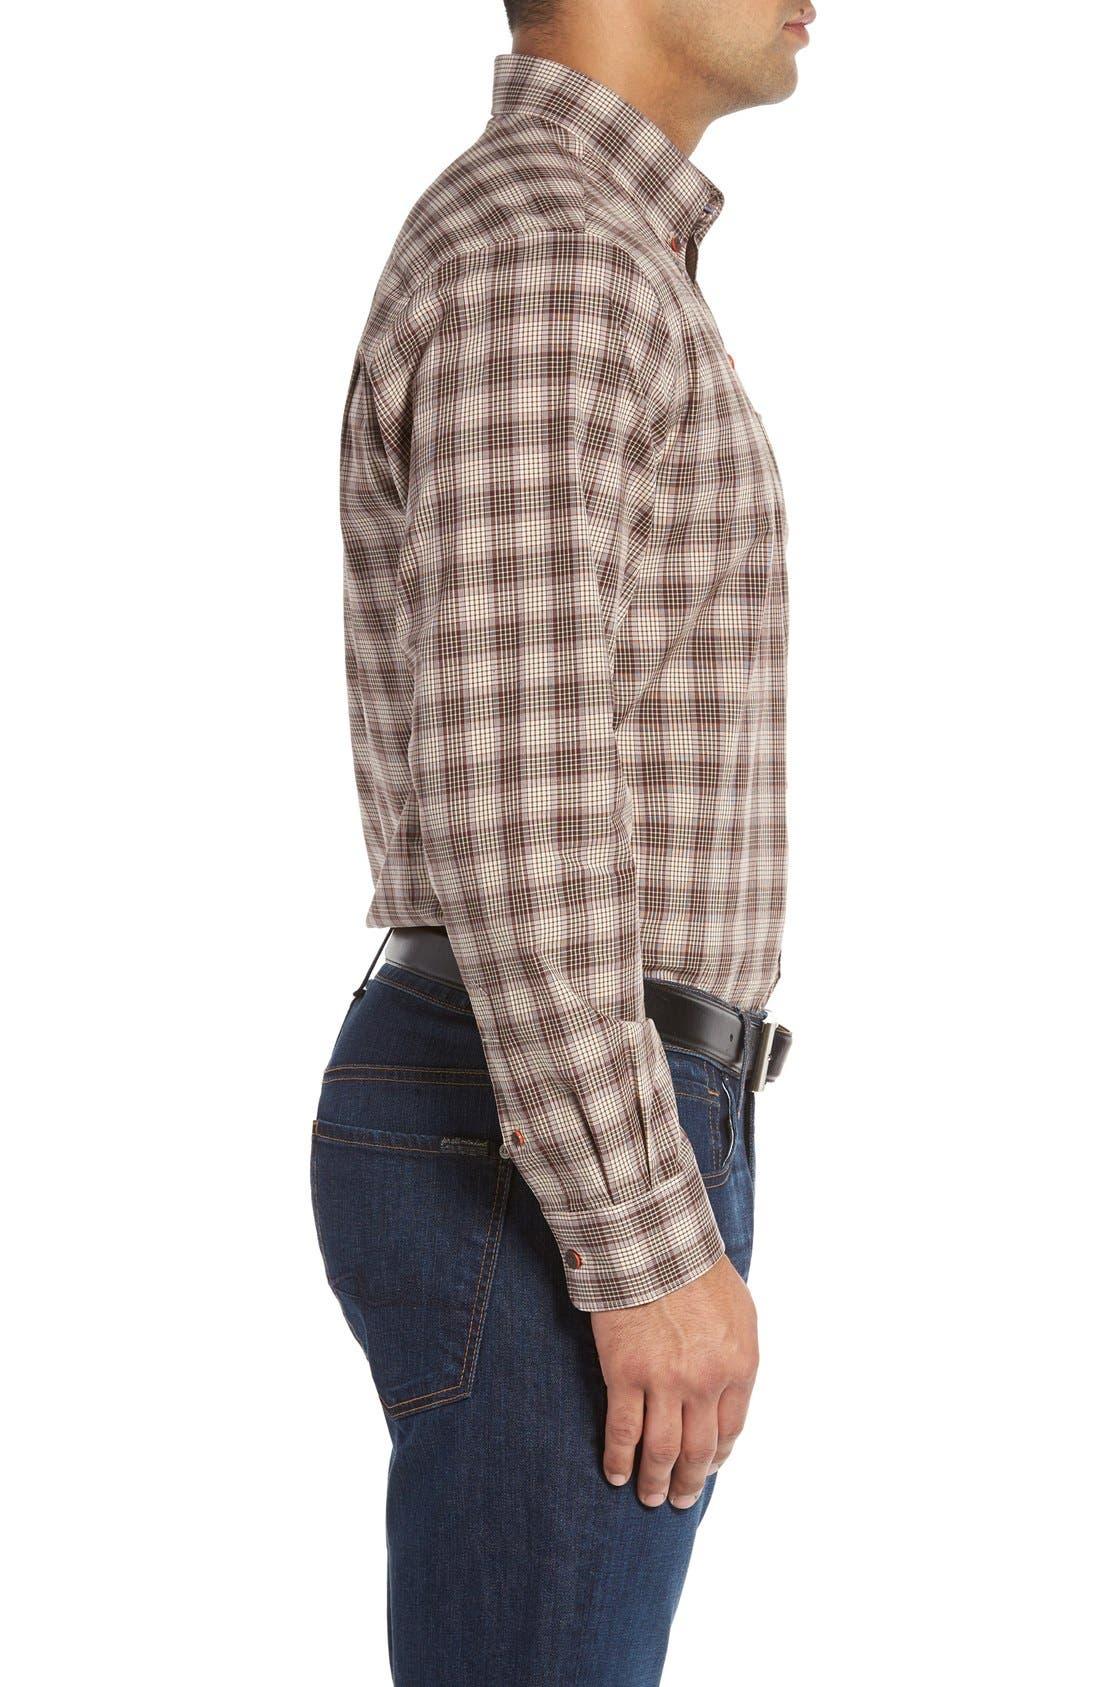 Alternate Image 3  - Cutter & Buck 'Ridge' Plaid Cotton Poplin Sport Shirt (Big & Tall)